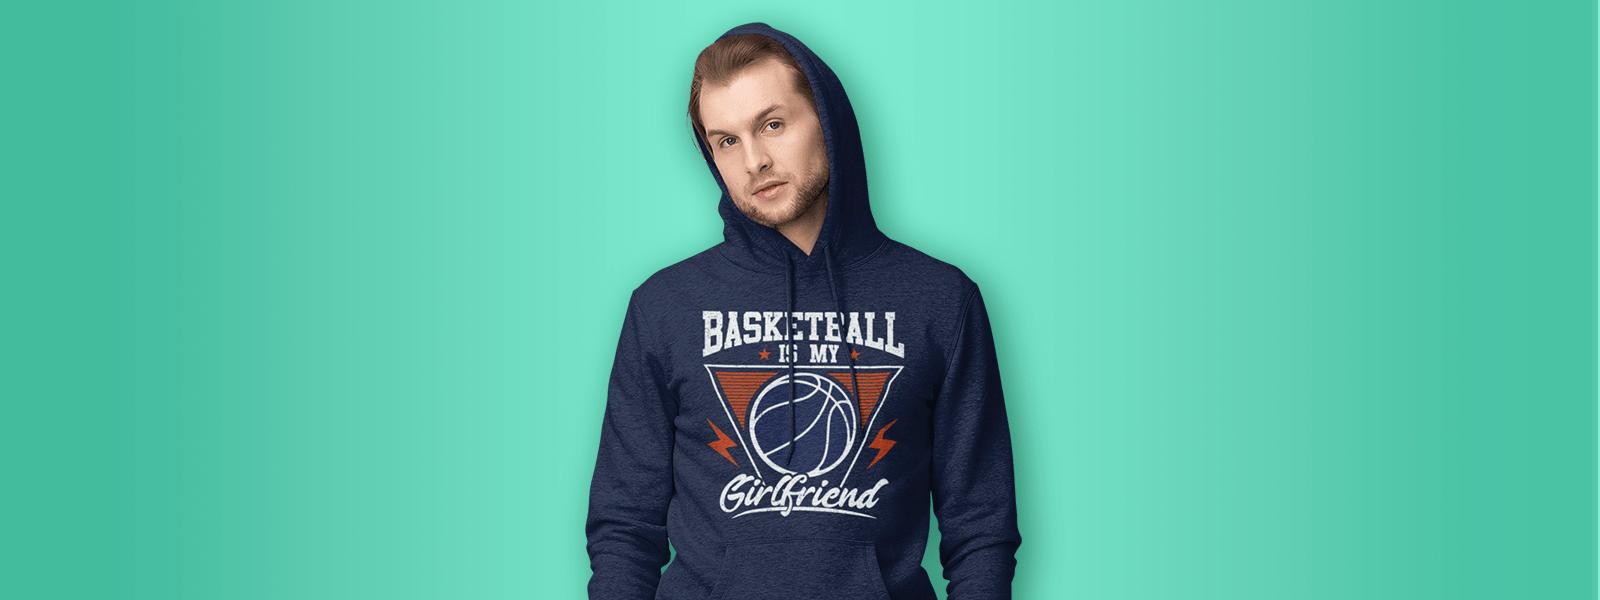 Best Sports Inspired Hoodies for Men